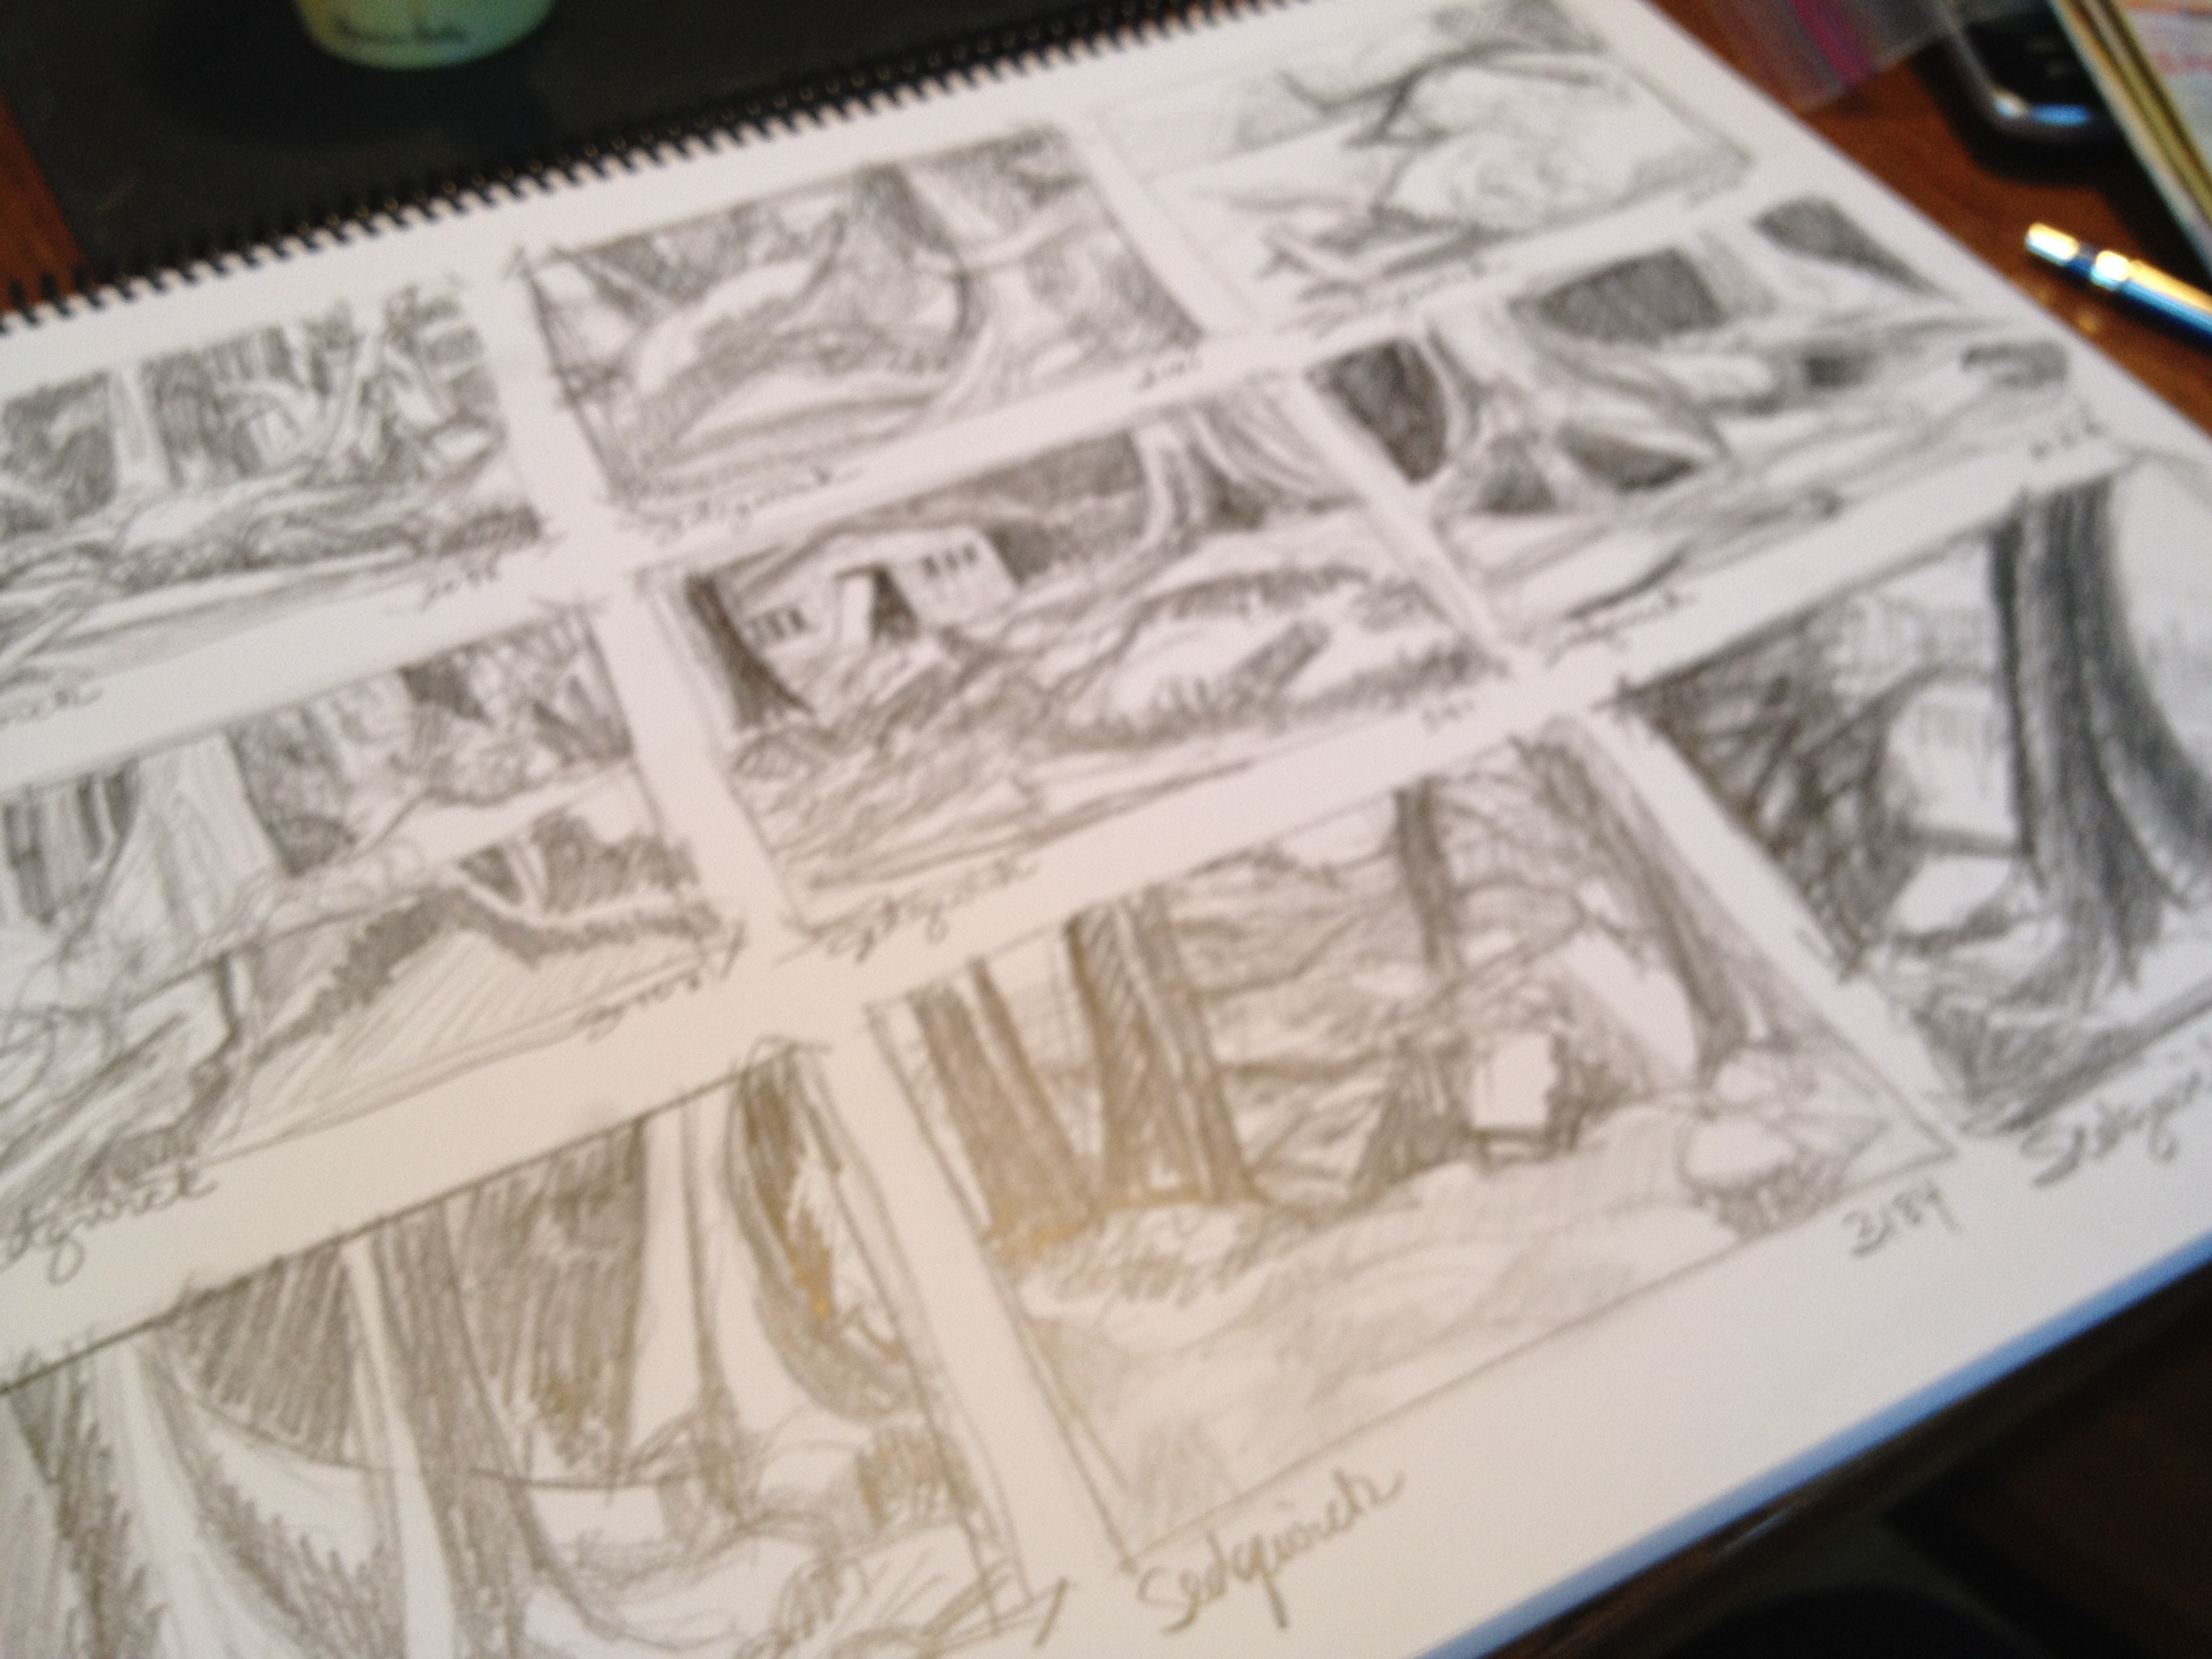 Thumbnail Sketches 3 - Janice Tanton, Gwaii Haanas National Park